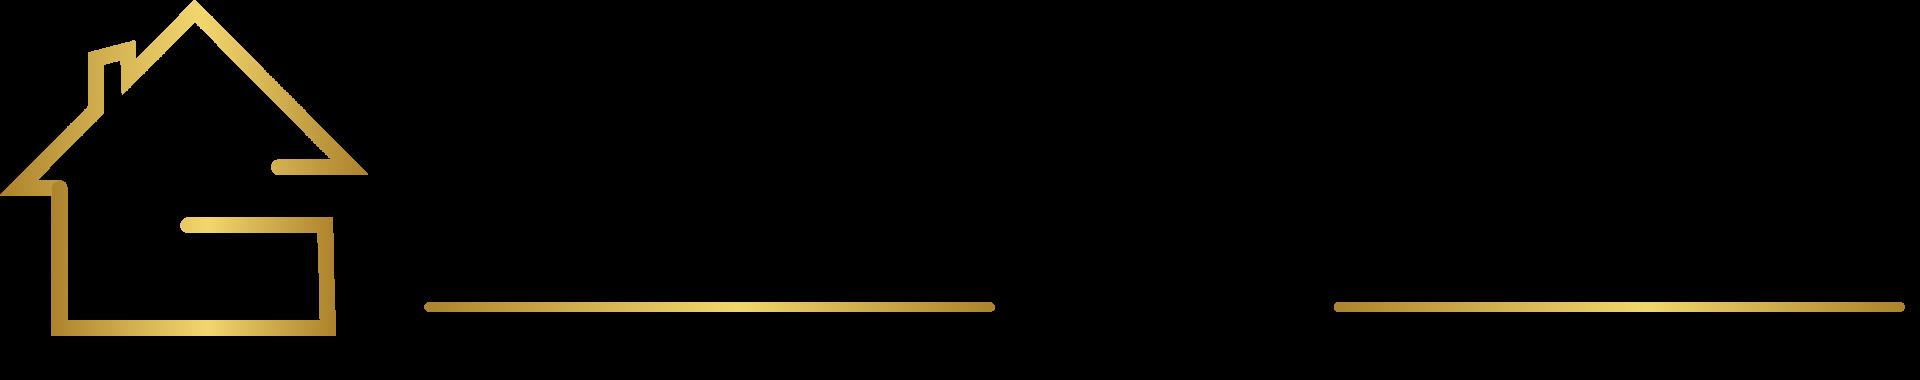 Top Real Estate Agents Baton Rouge Louisiana | GoldCrest